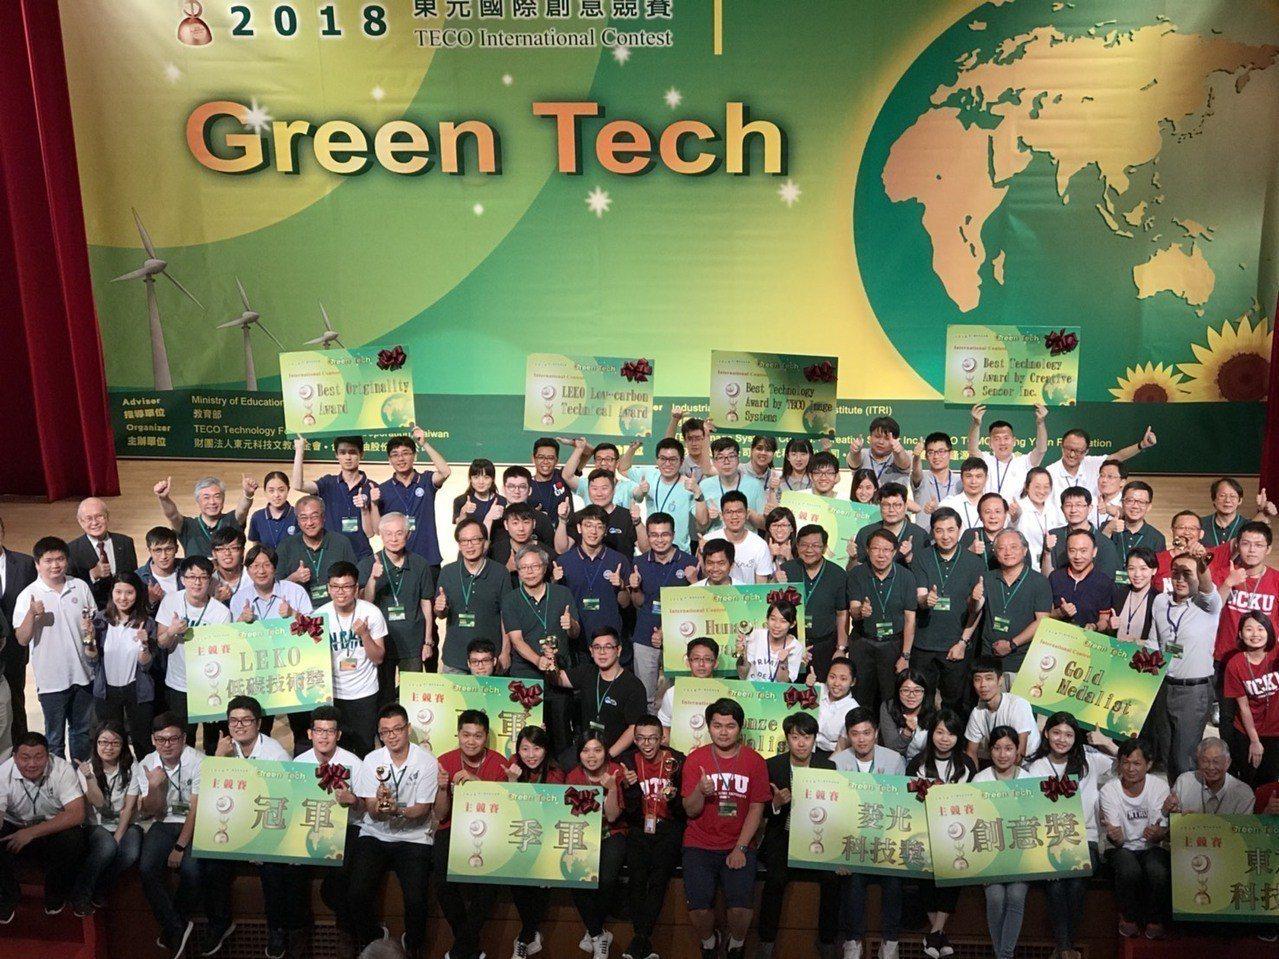 Green Tech國際創意競賽落幕。圖/主辦單位提供